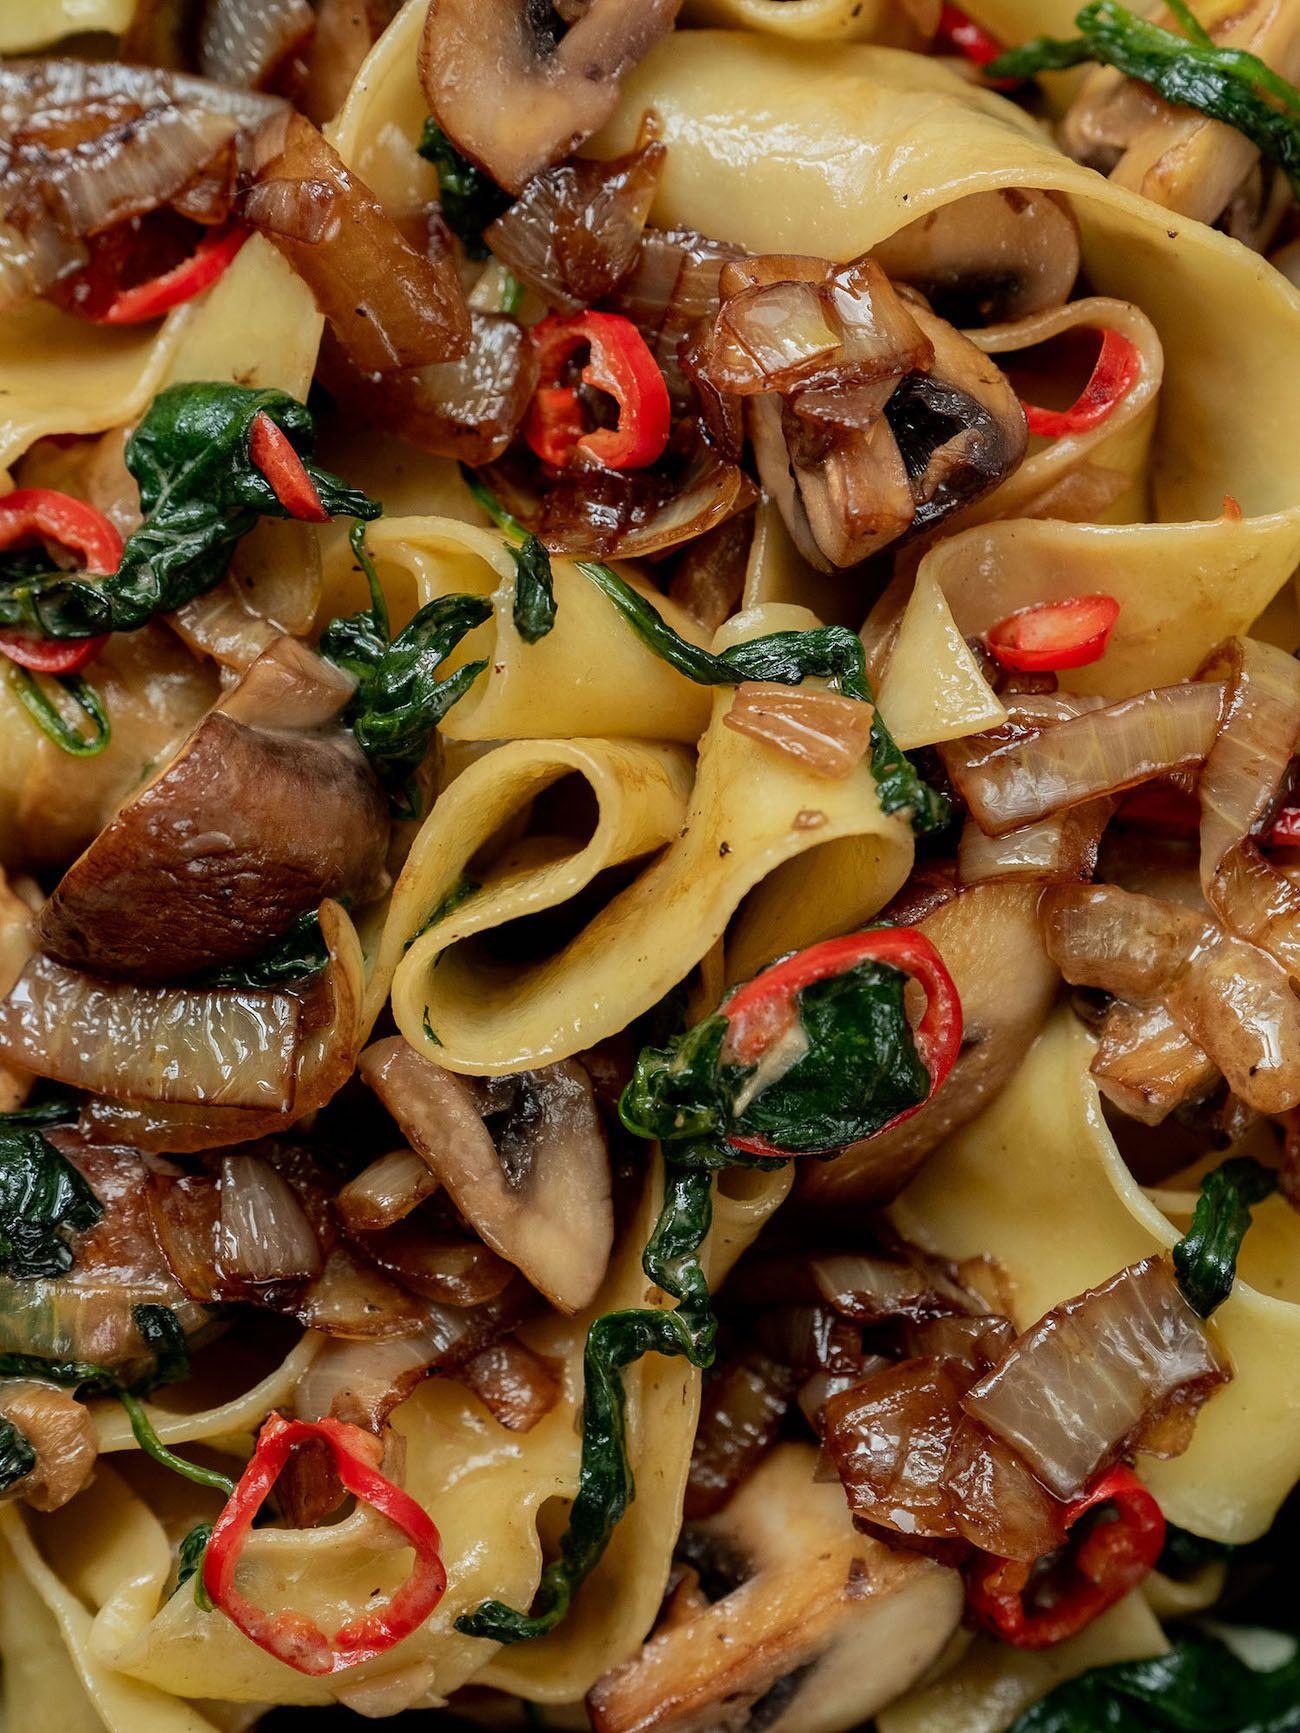 Foodblog About Fuel_Papardelle mit Champignons, Spinat und Balsamico Zwiebeln, Pasta, Peperoni